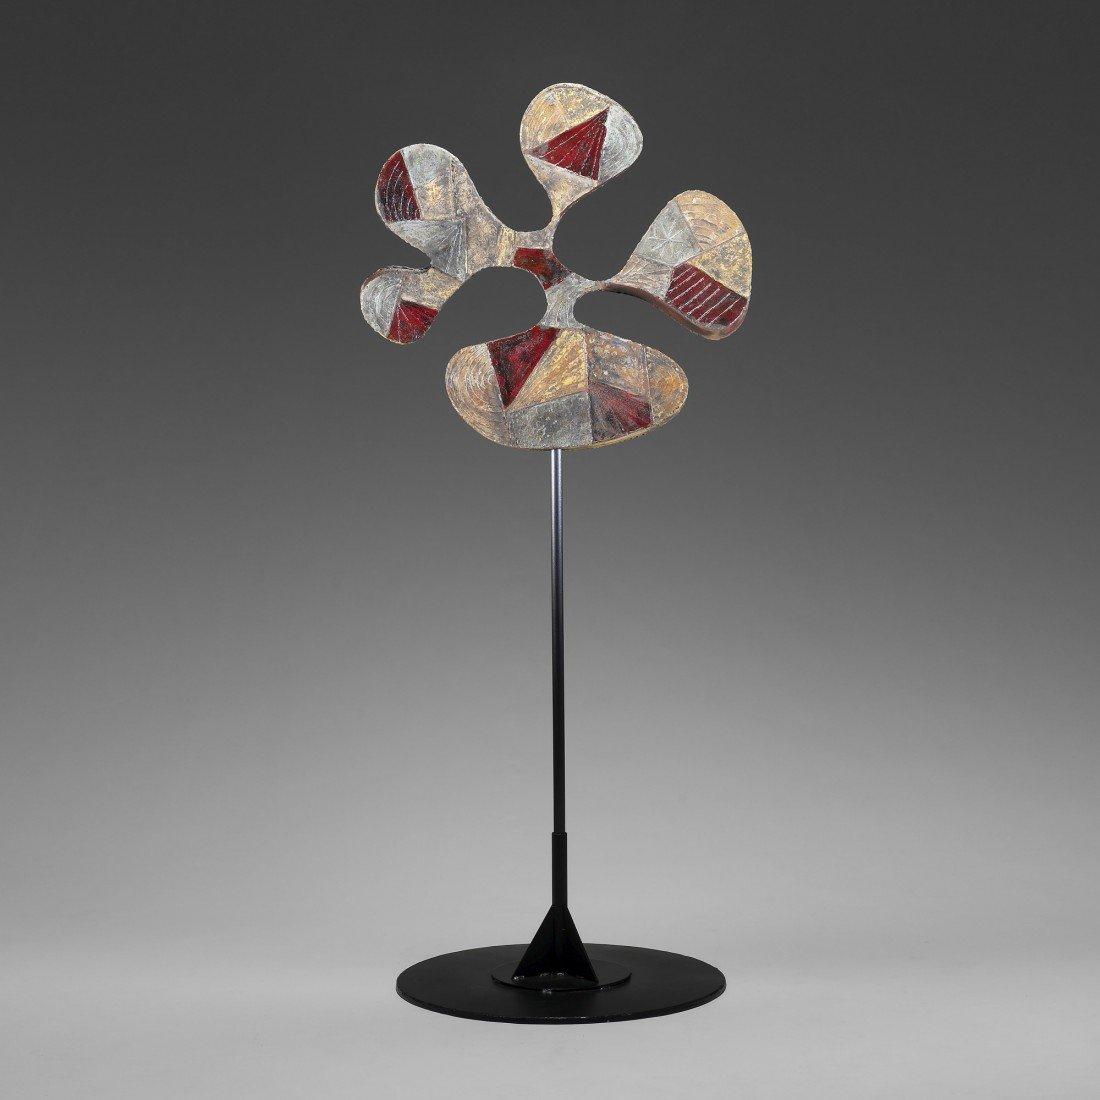 109: Paul Evans Polychromed sculpture